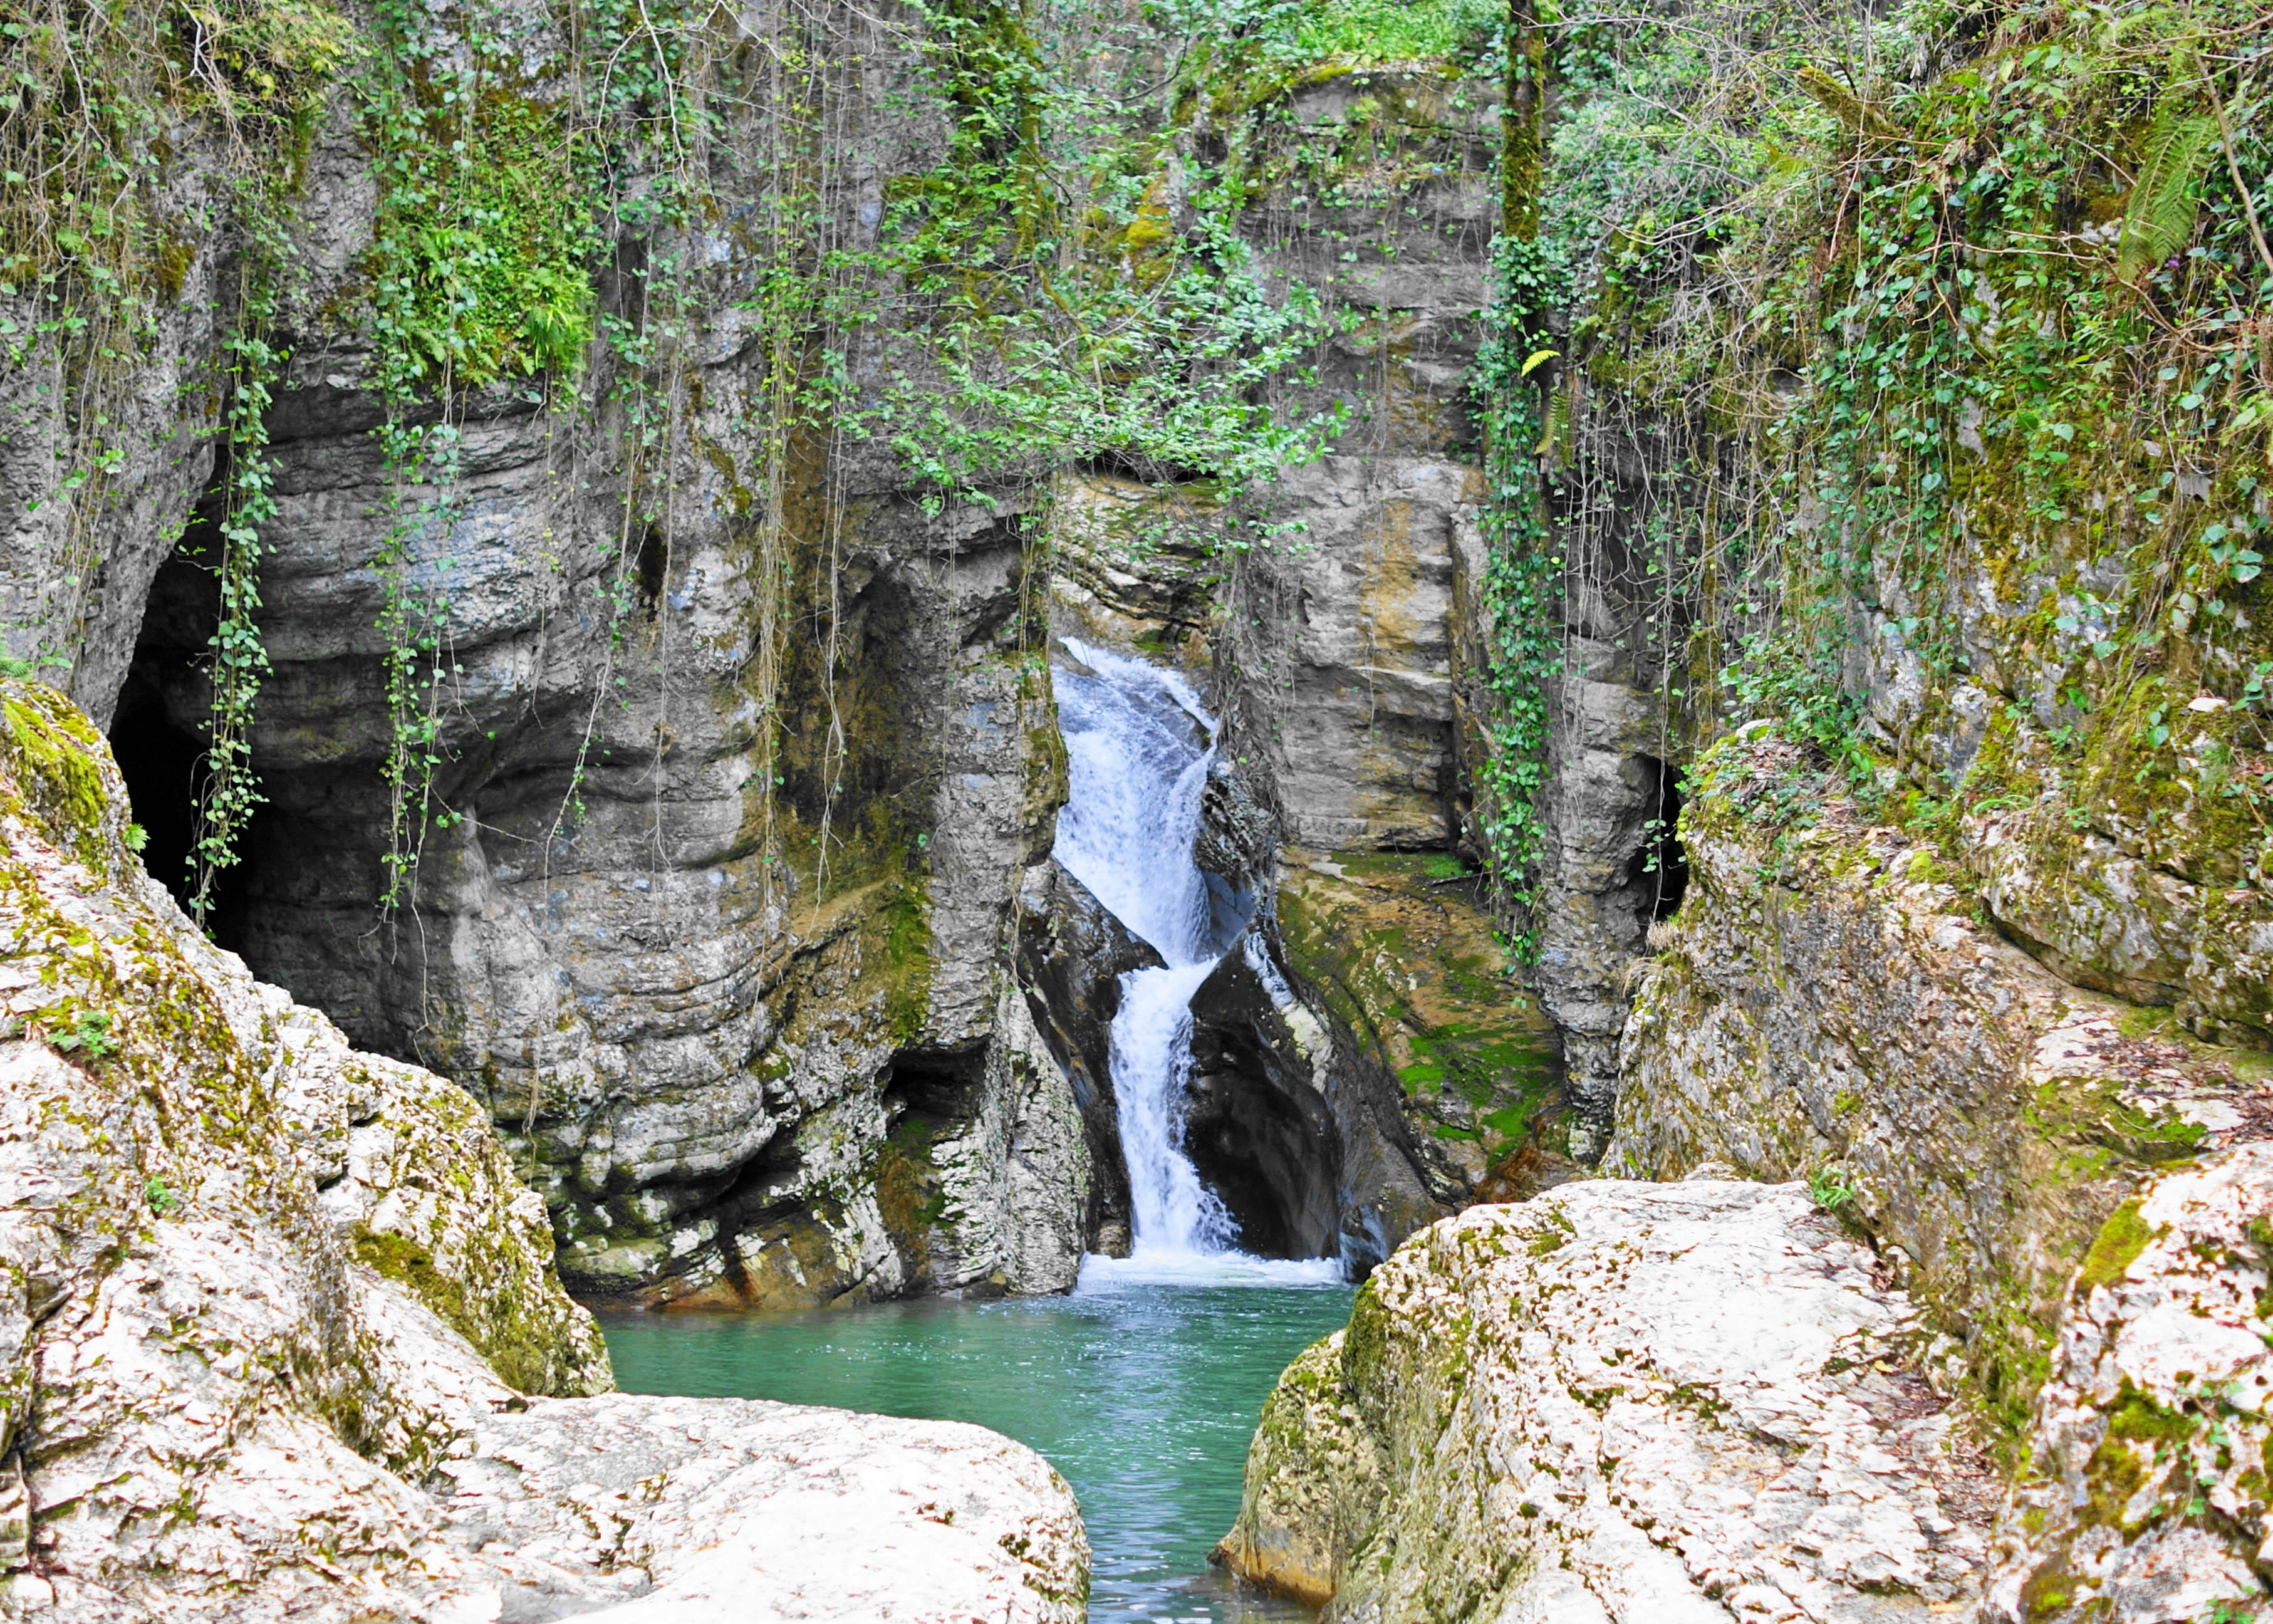 Agura Waterfalls near Sochi, Russia